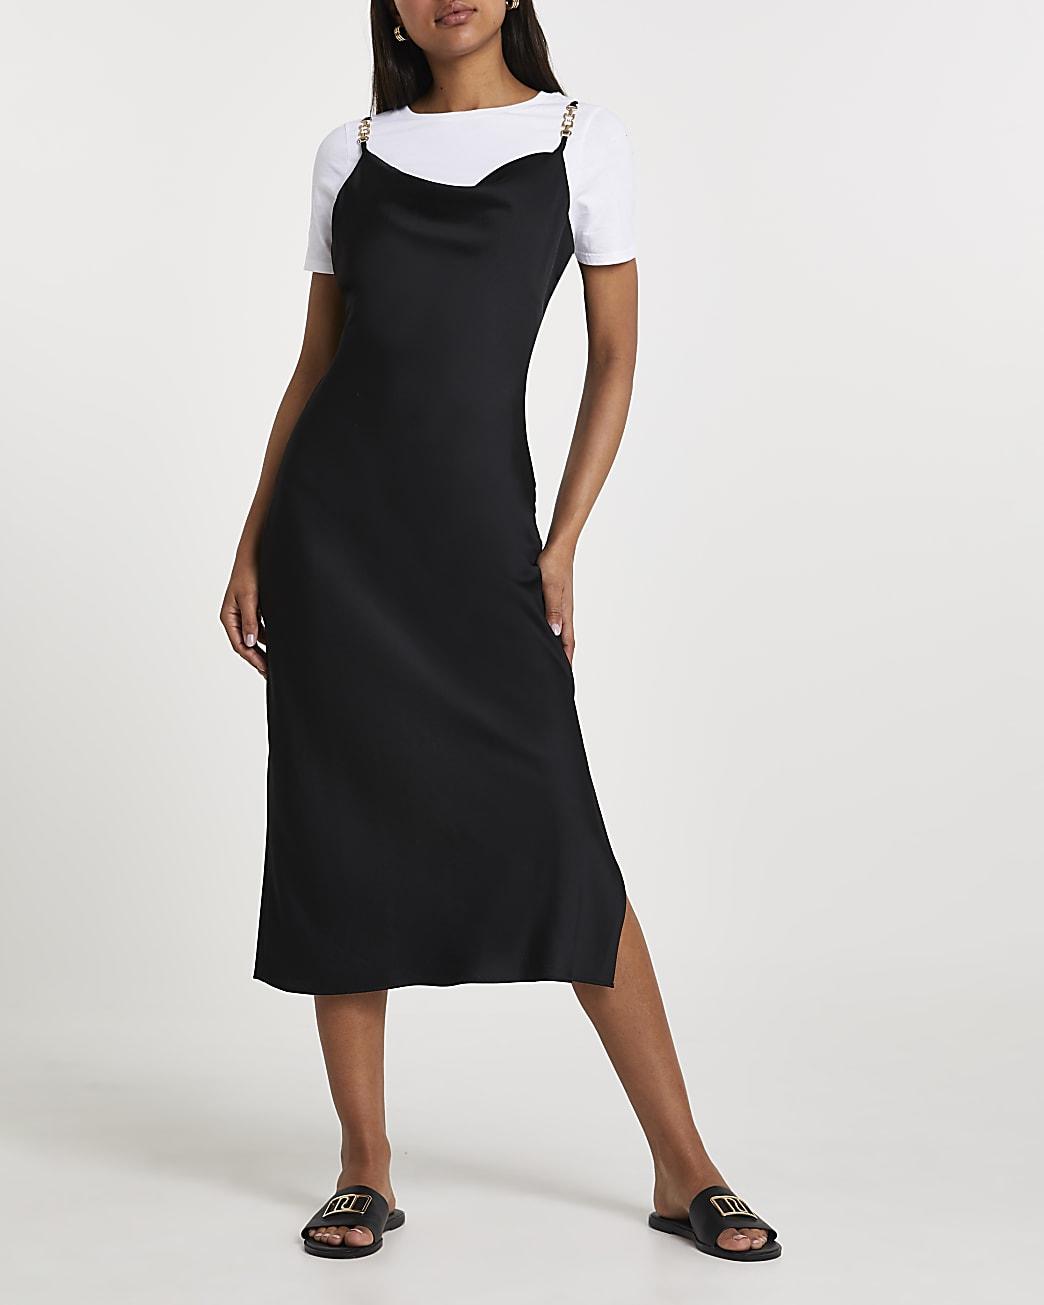 Black cowl neck midi dress with t-shirt